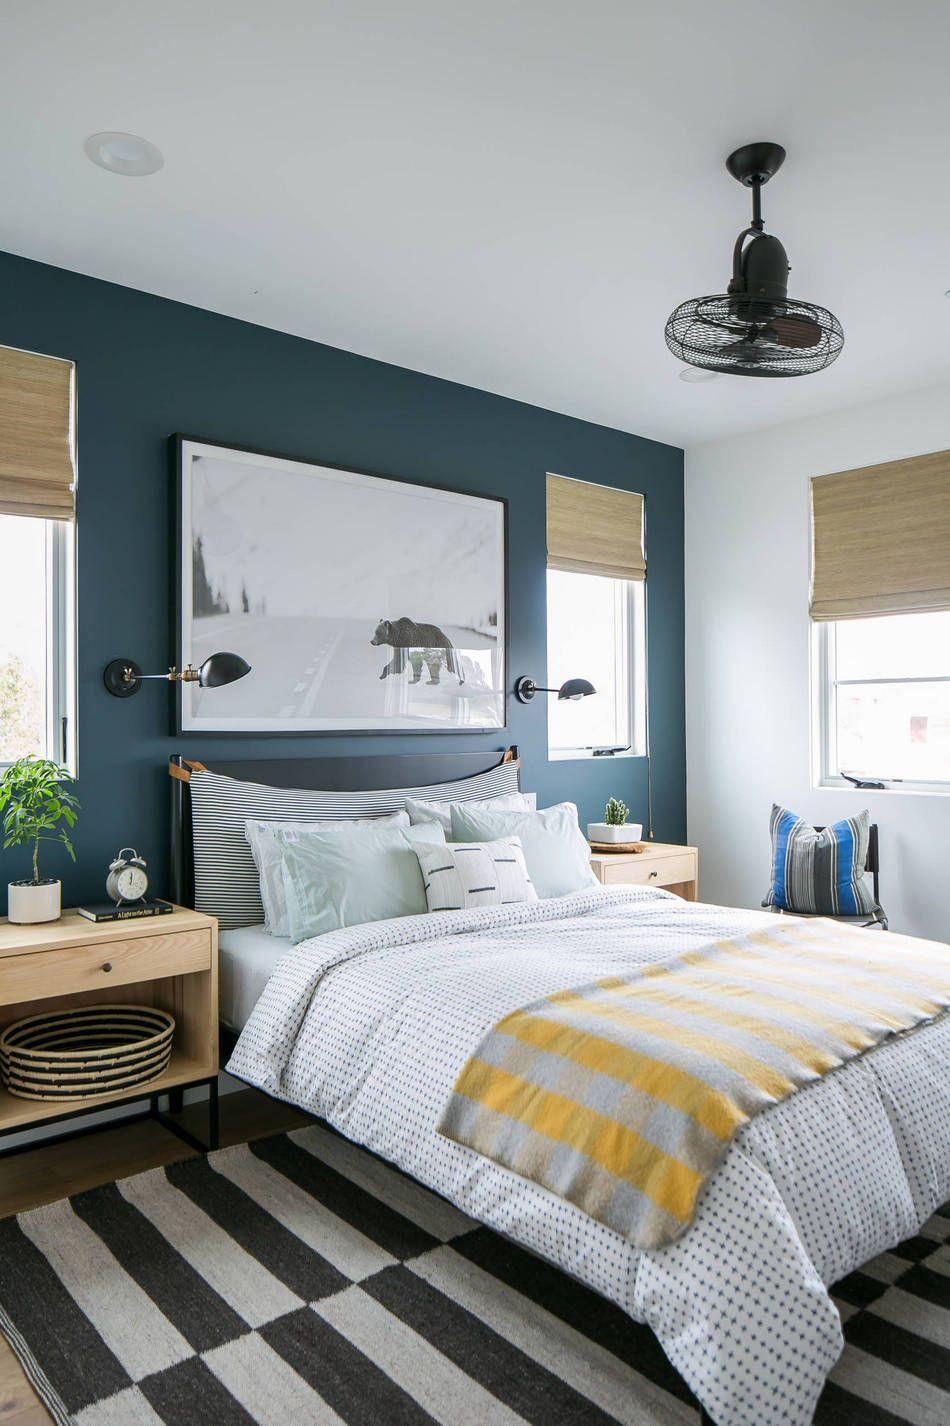 Moody Teal Bedroom Accent Wall Master Bedroom Interior Design